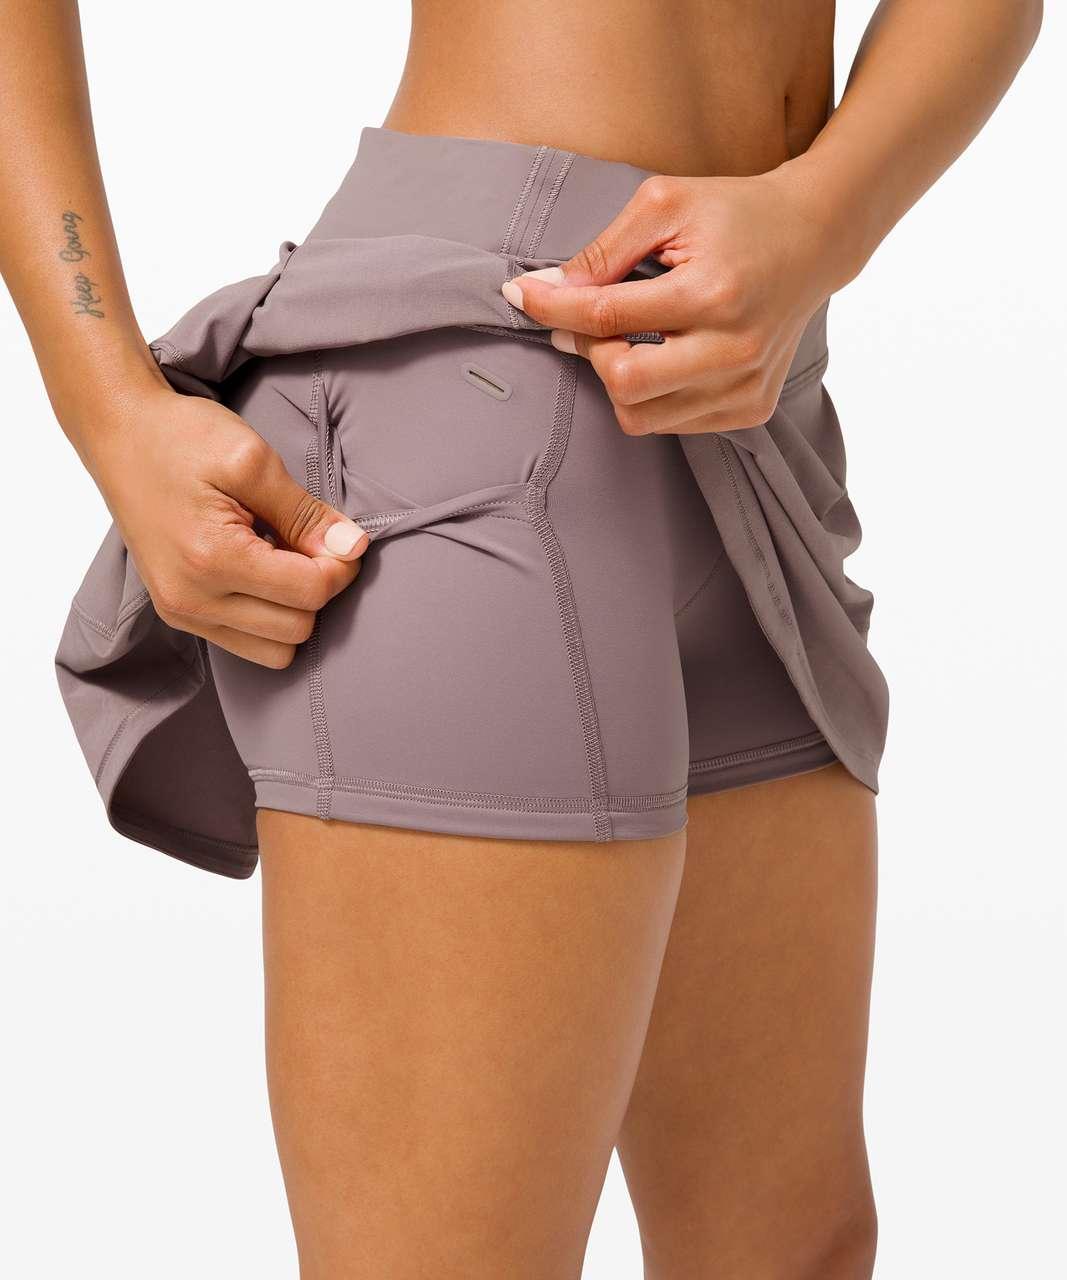 "Lululemon Pace Rival Skirt (Tall) *4-way Stretch 15"" - Violet Verbena"